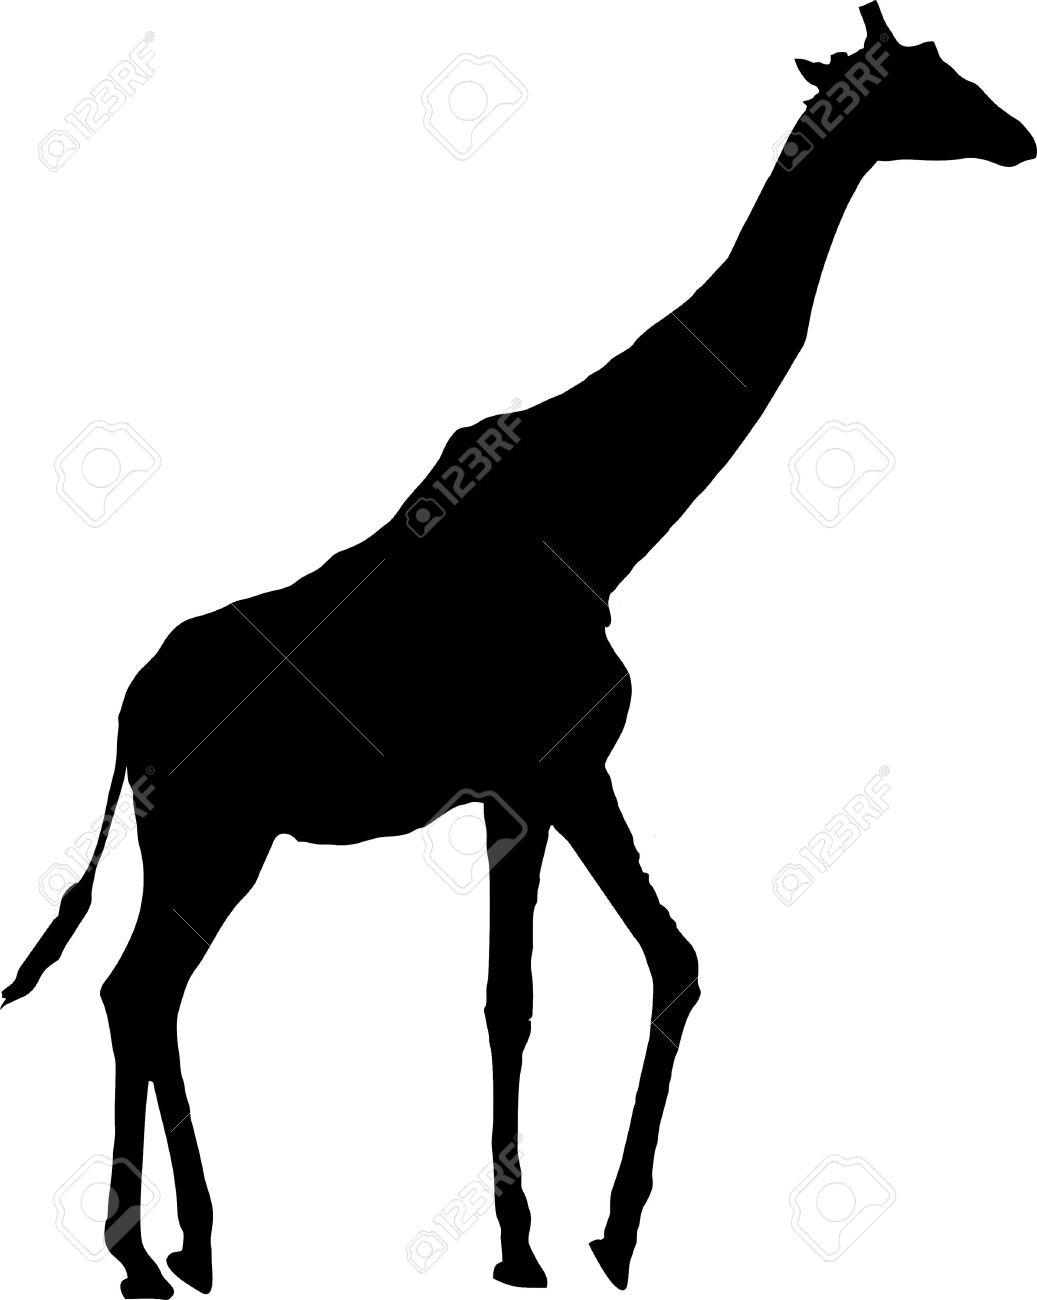 1037x1300 Giraffe, Suggestions For Giraffe, Download Giraffe